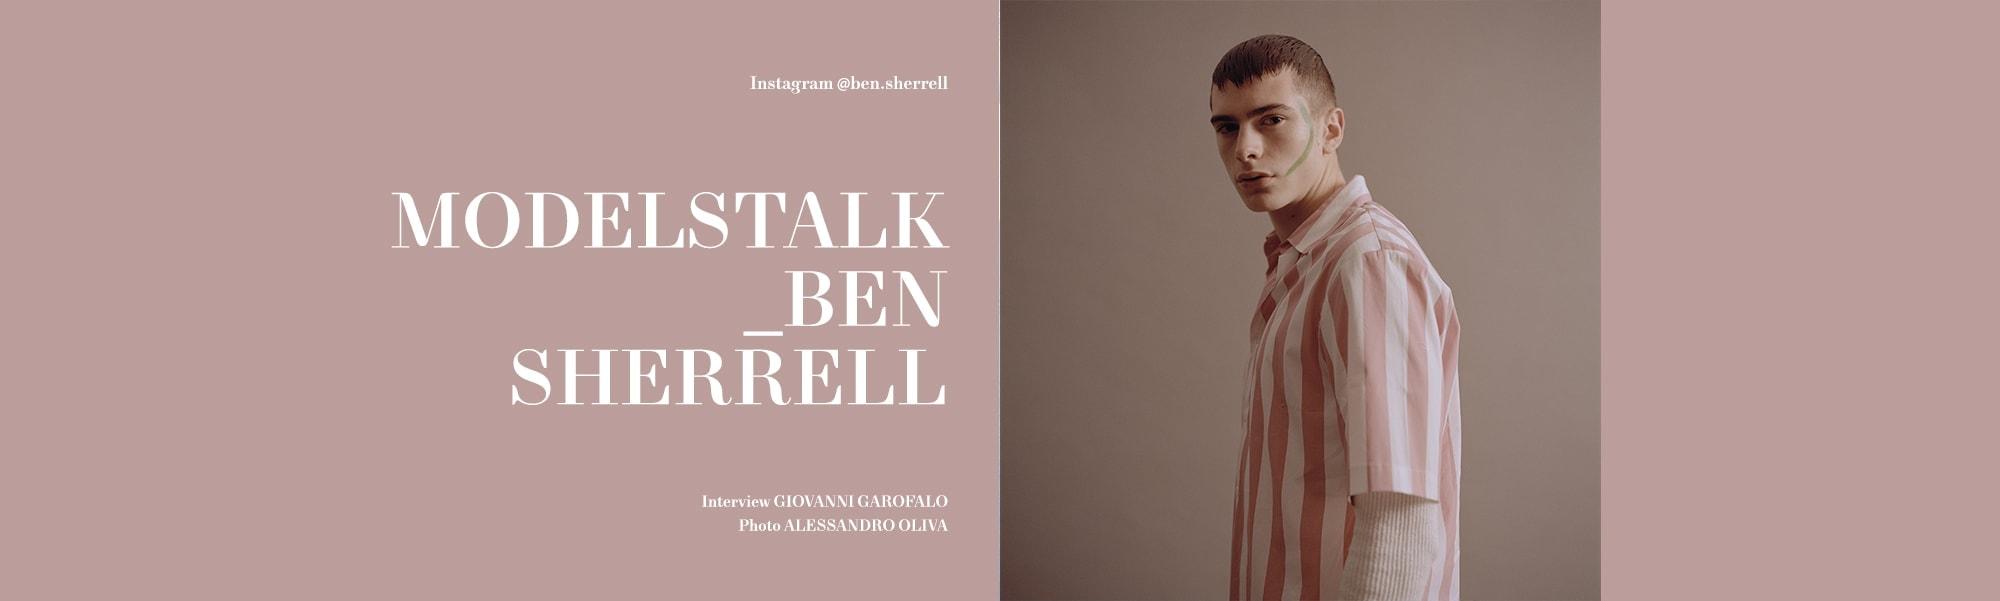 ben-sherrell-main-banner-thegreatestmagazine-talkinghead